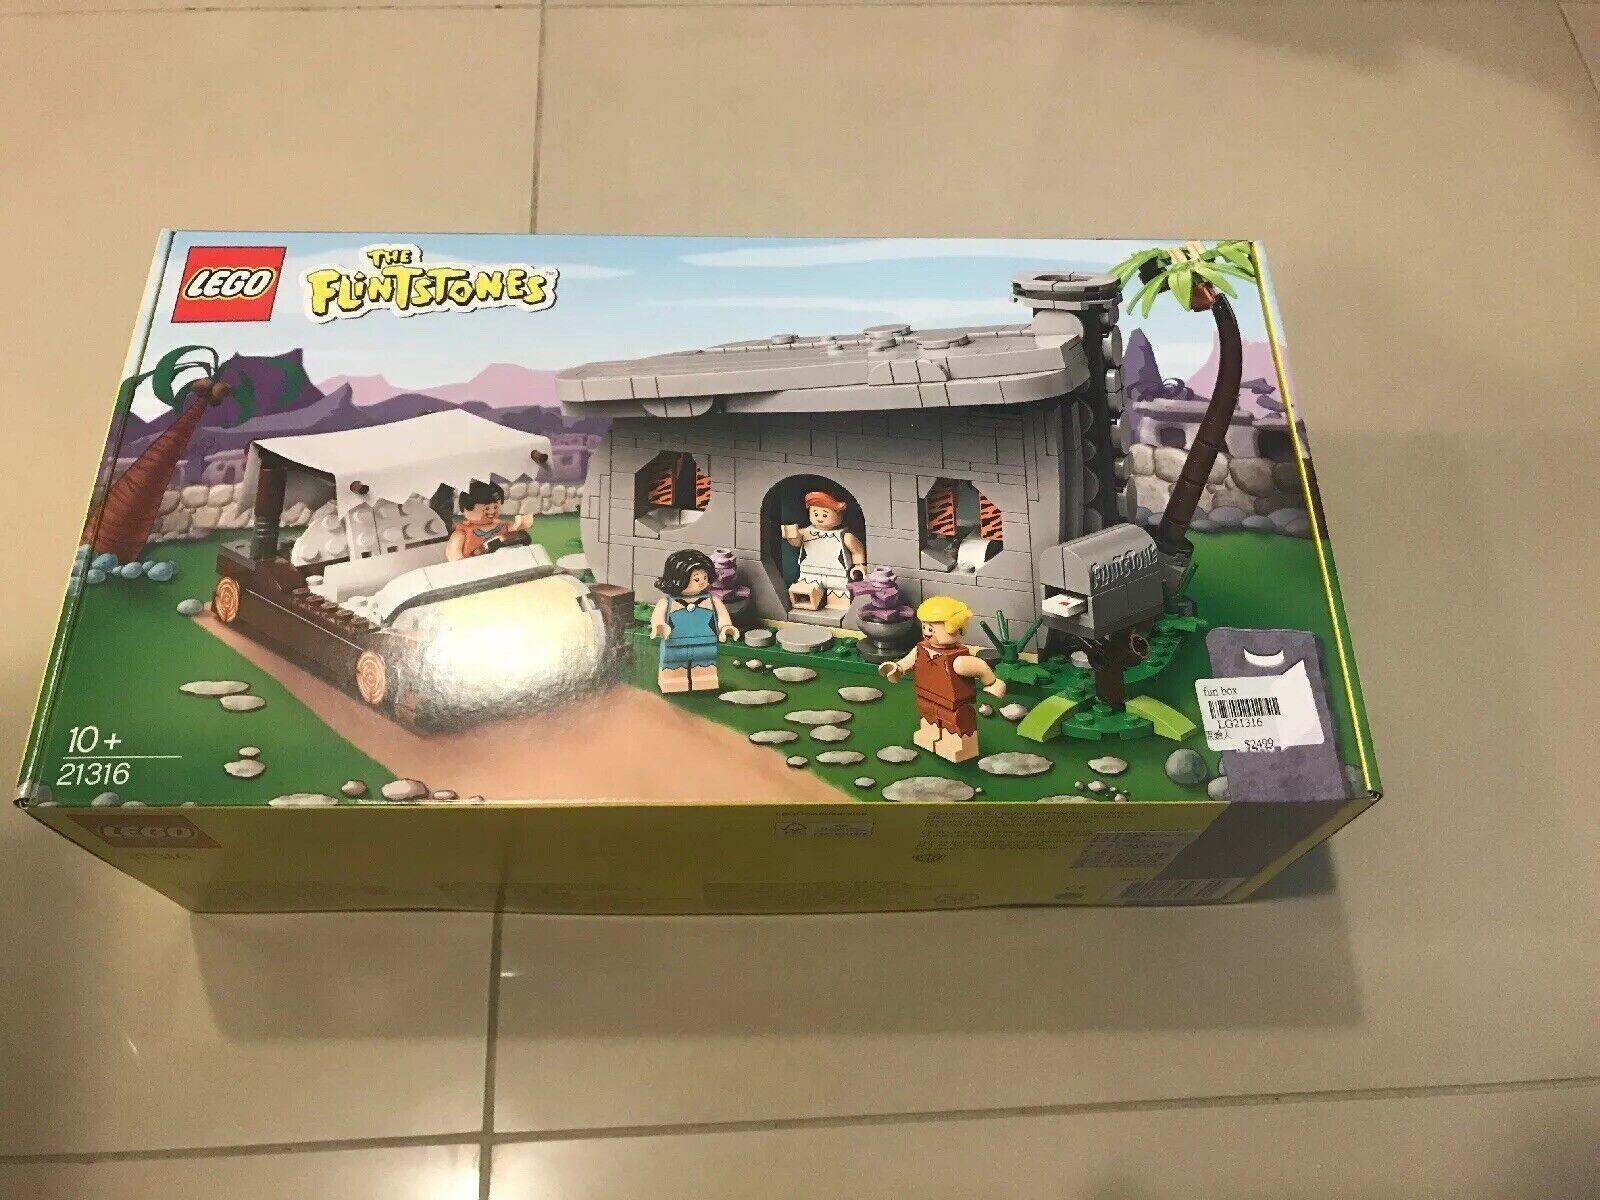 Limited Edition Edition Edition flintstone Lego - Ready To Ship 3cb308